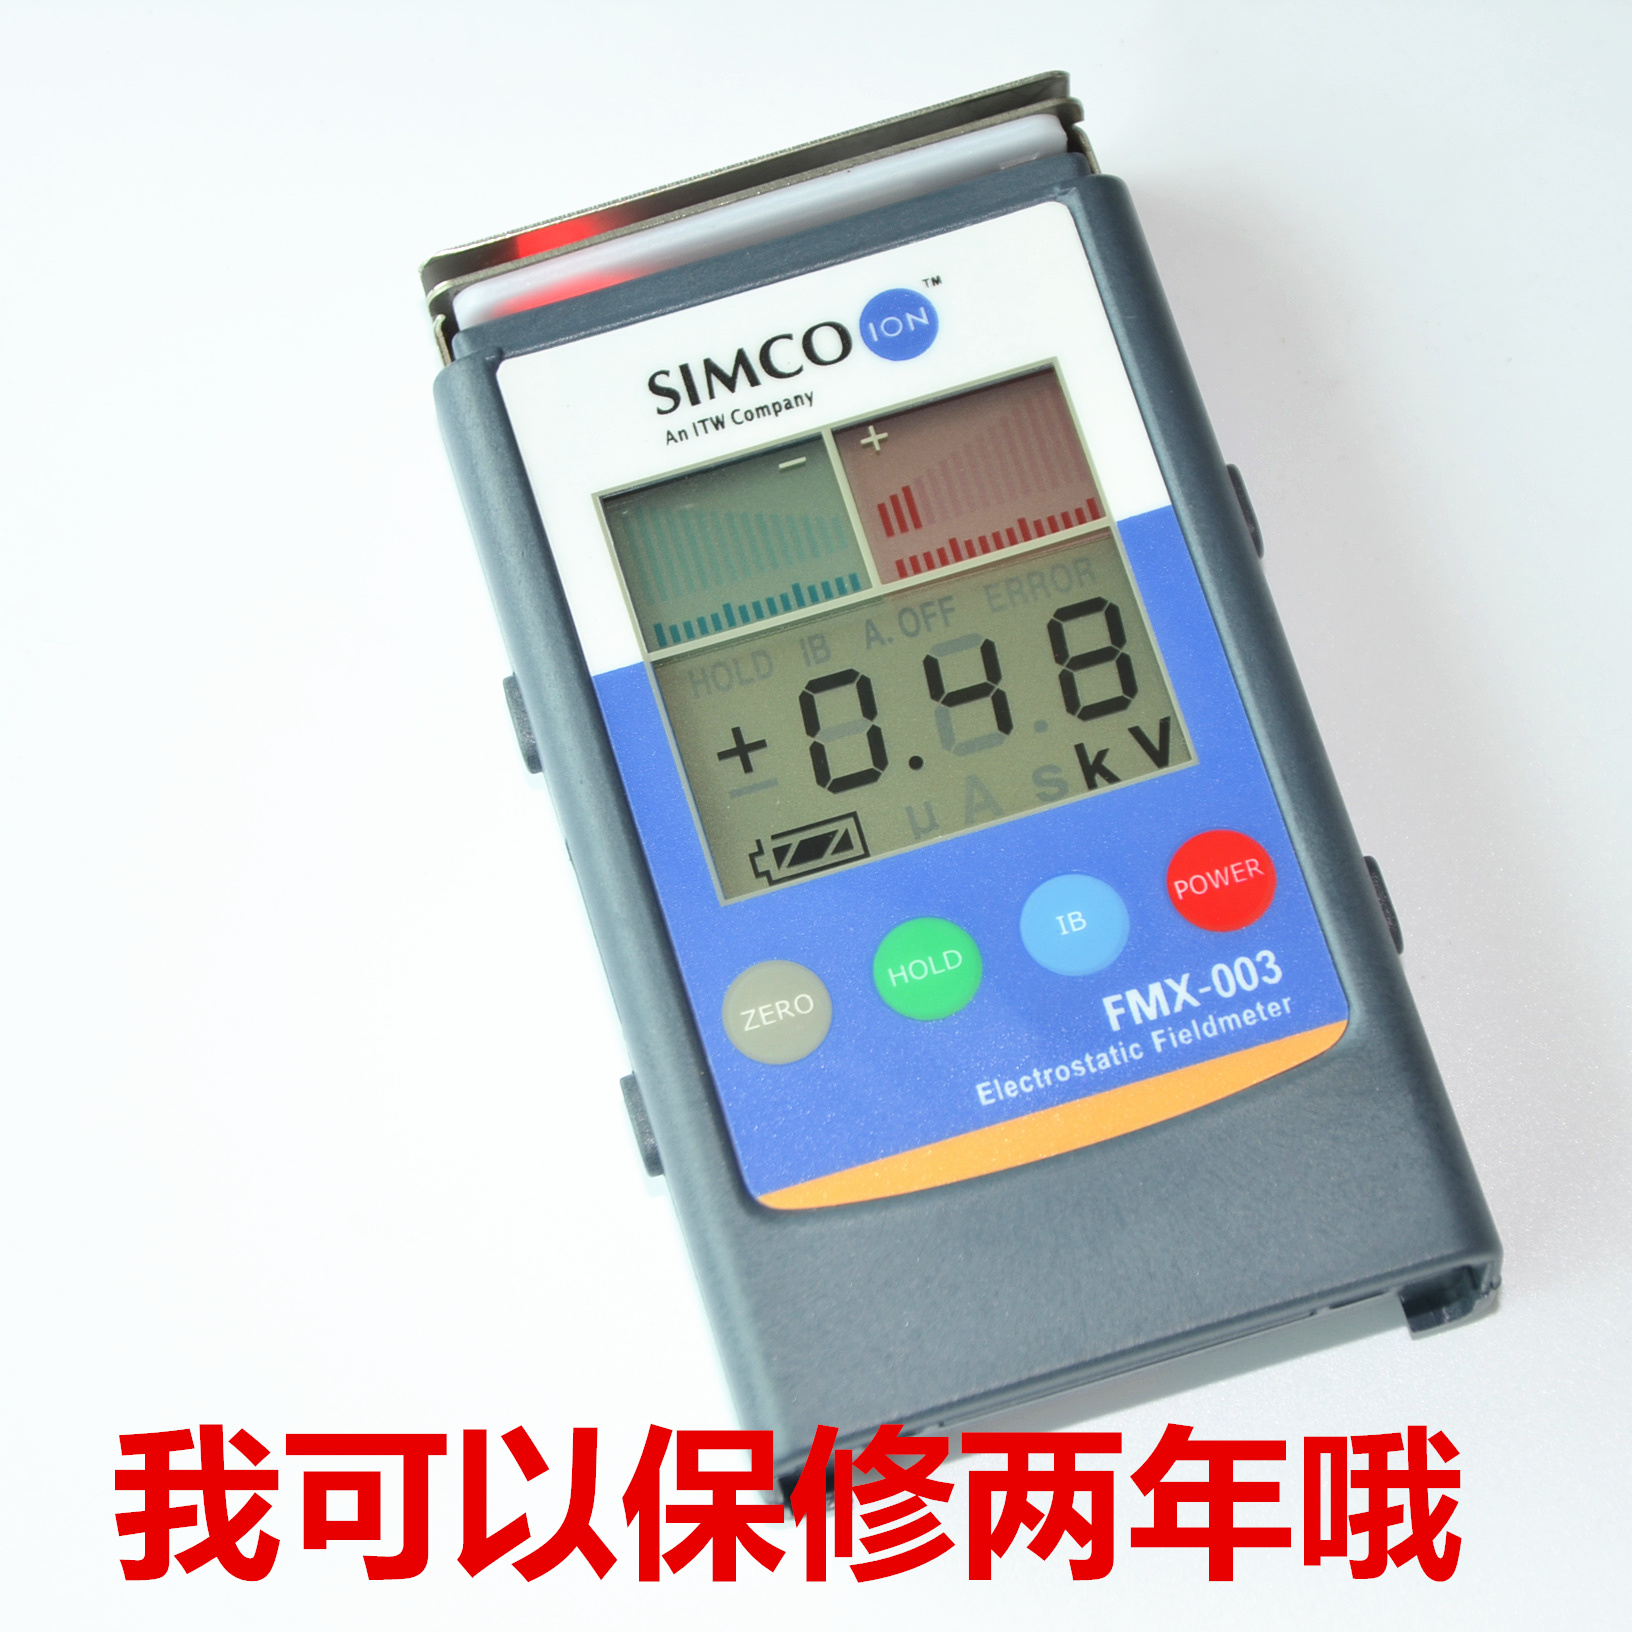 SIMCO FMX-003静电测试仪中文说明书